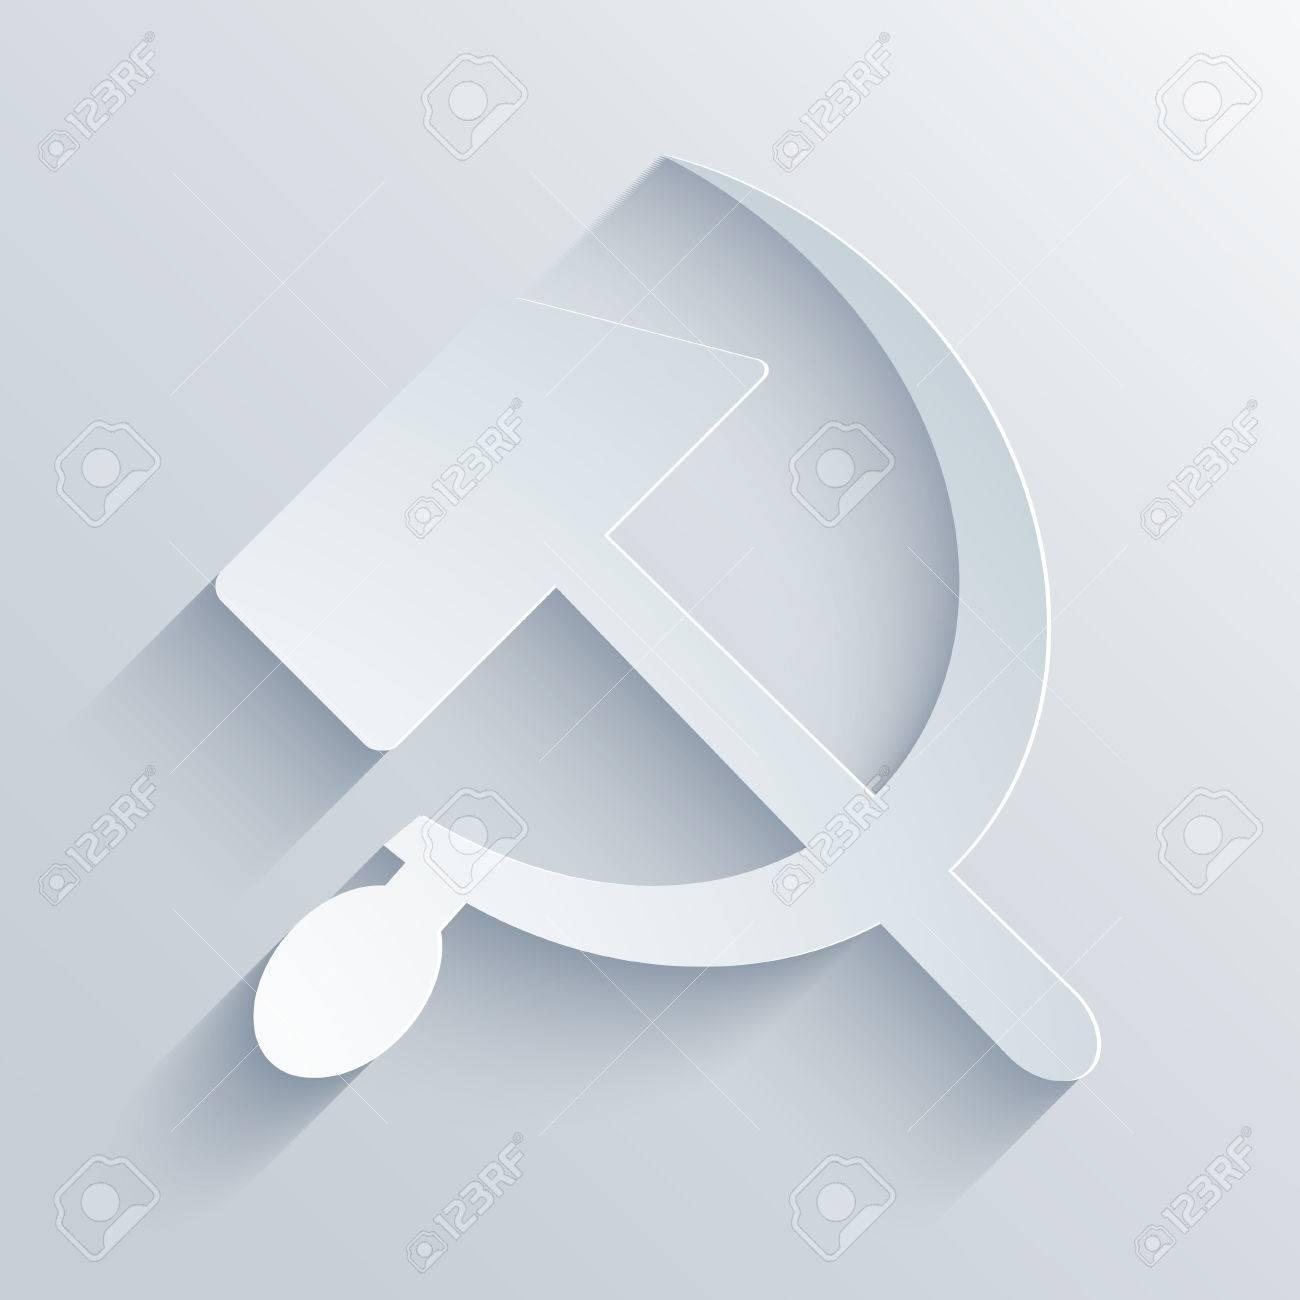 Modern Sickle And Hammer Symbol Background